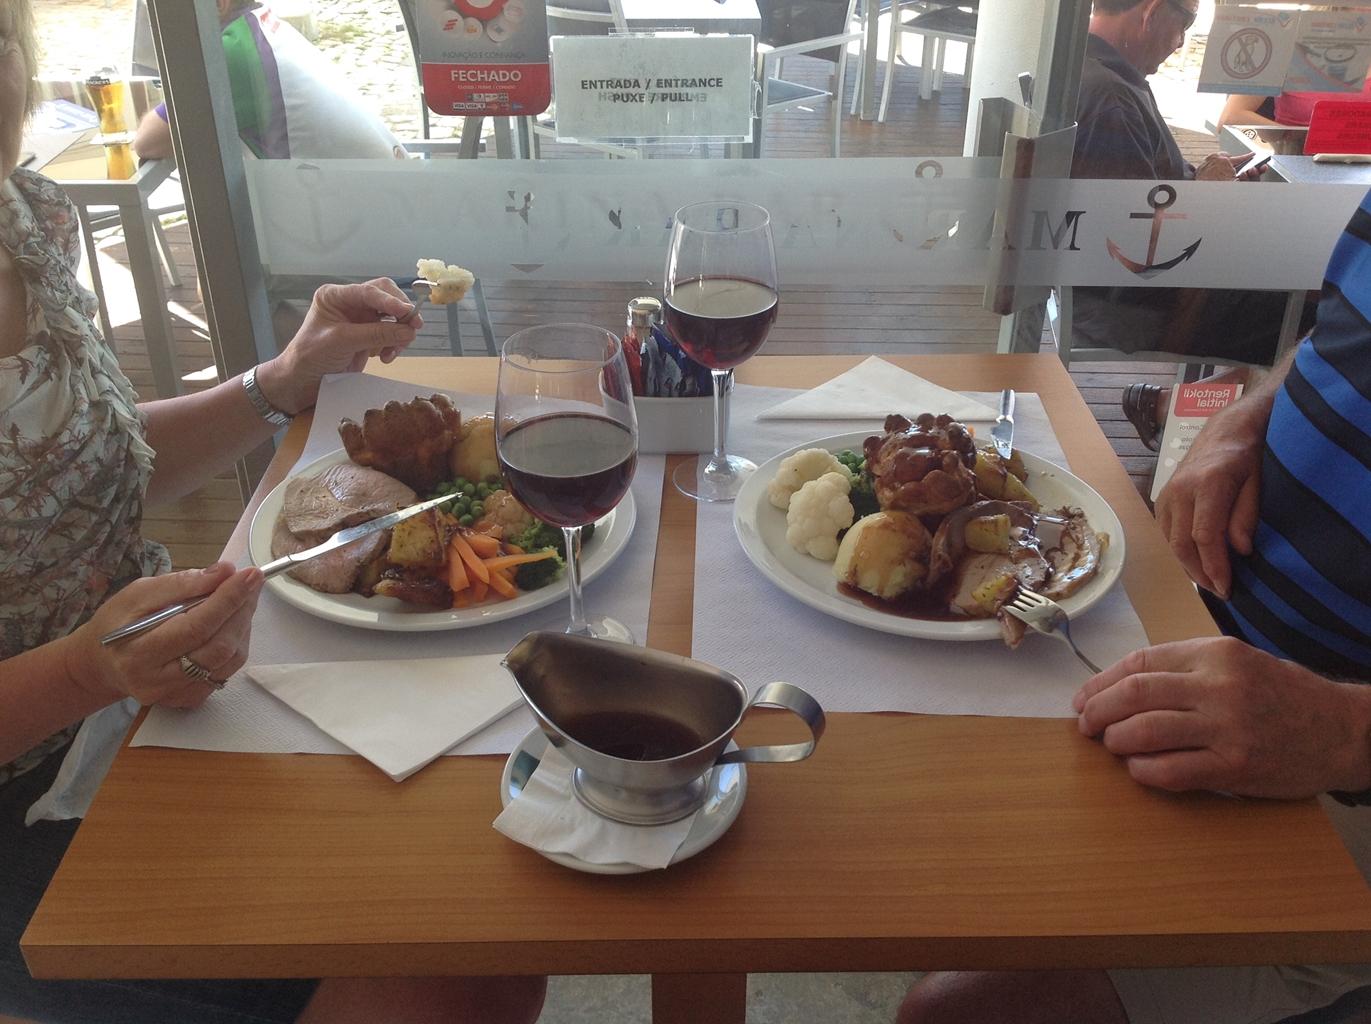 Marina Bar Lagos Breakfast, Lunch and Dinner in Lagos Portugal 11 - Sports Bar Lagos and Restaurant Bar Lagos Algarve portugal